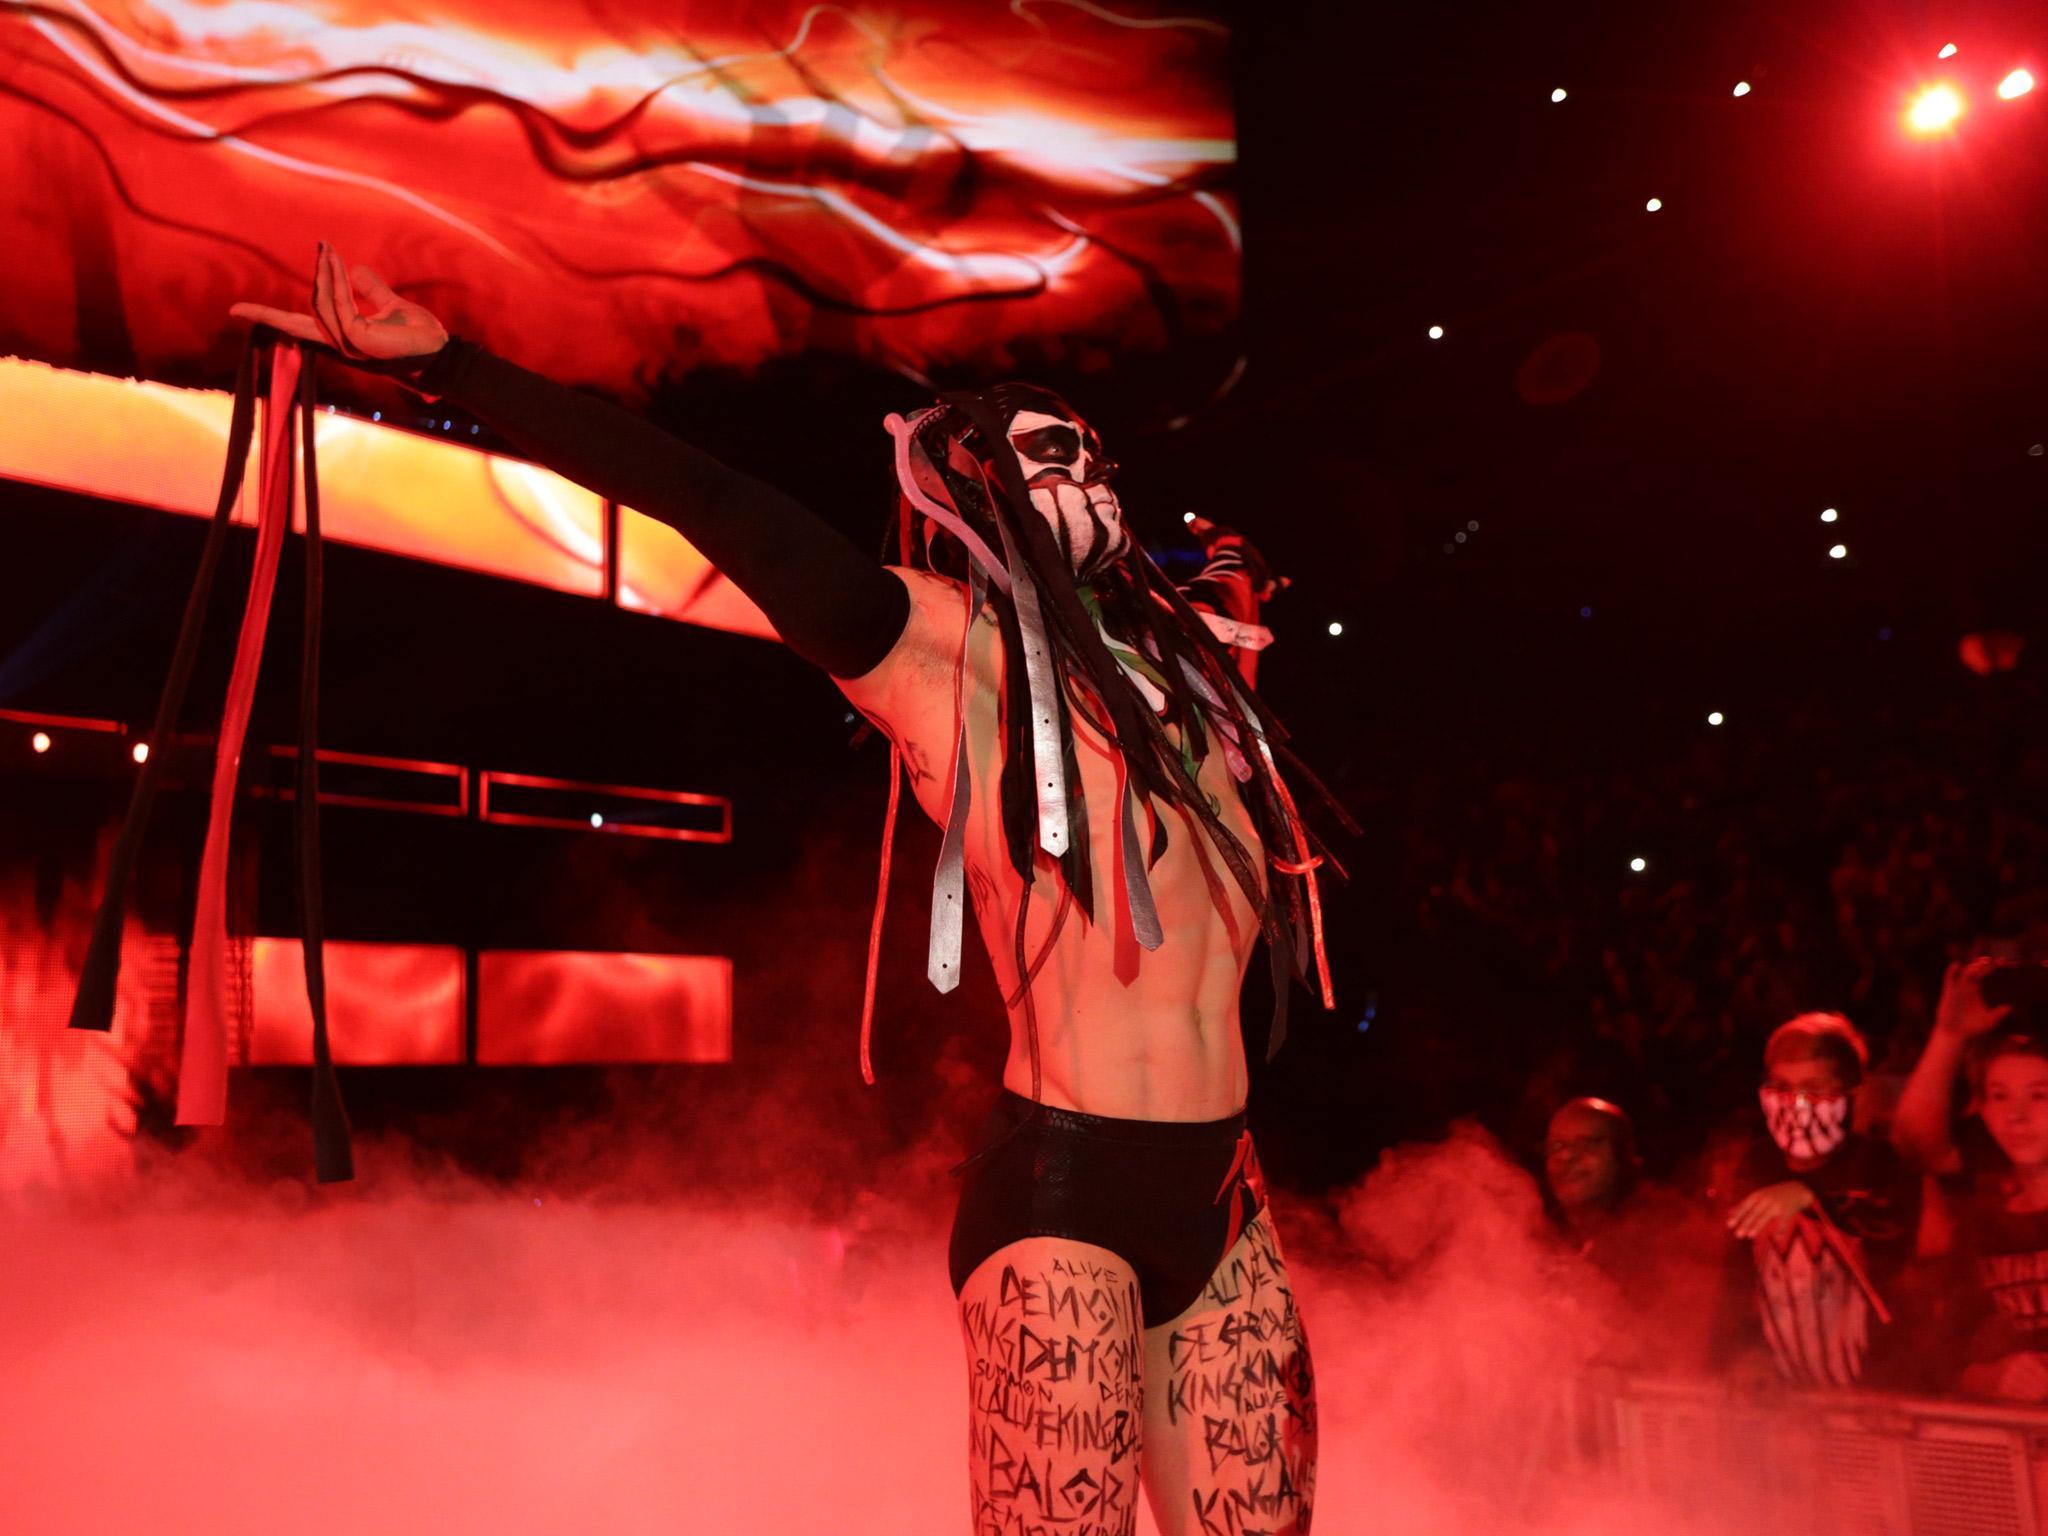 WWE SummerSlam: AJ Styles and John Cena shine while Brock